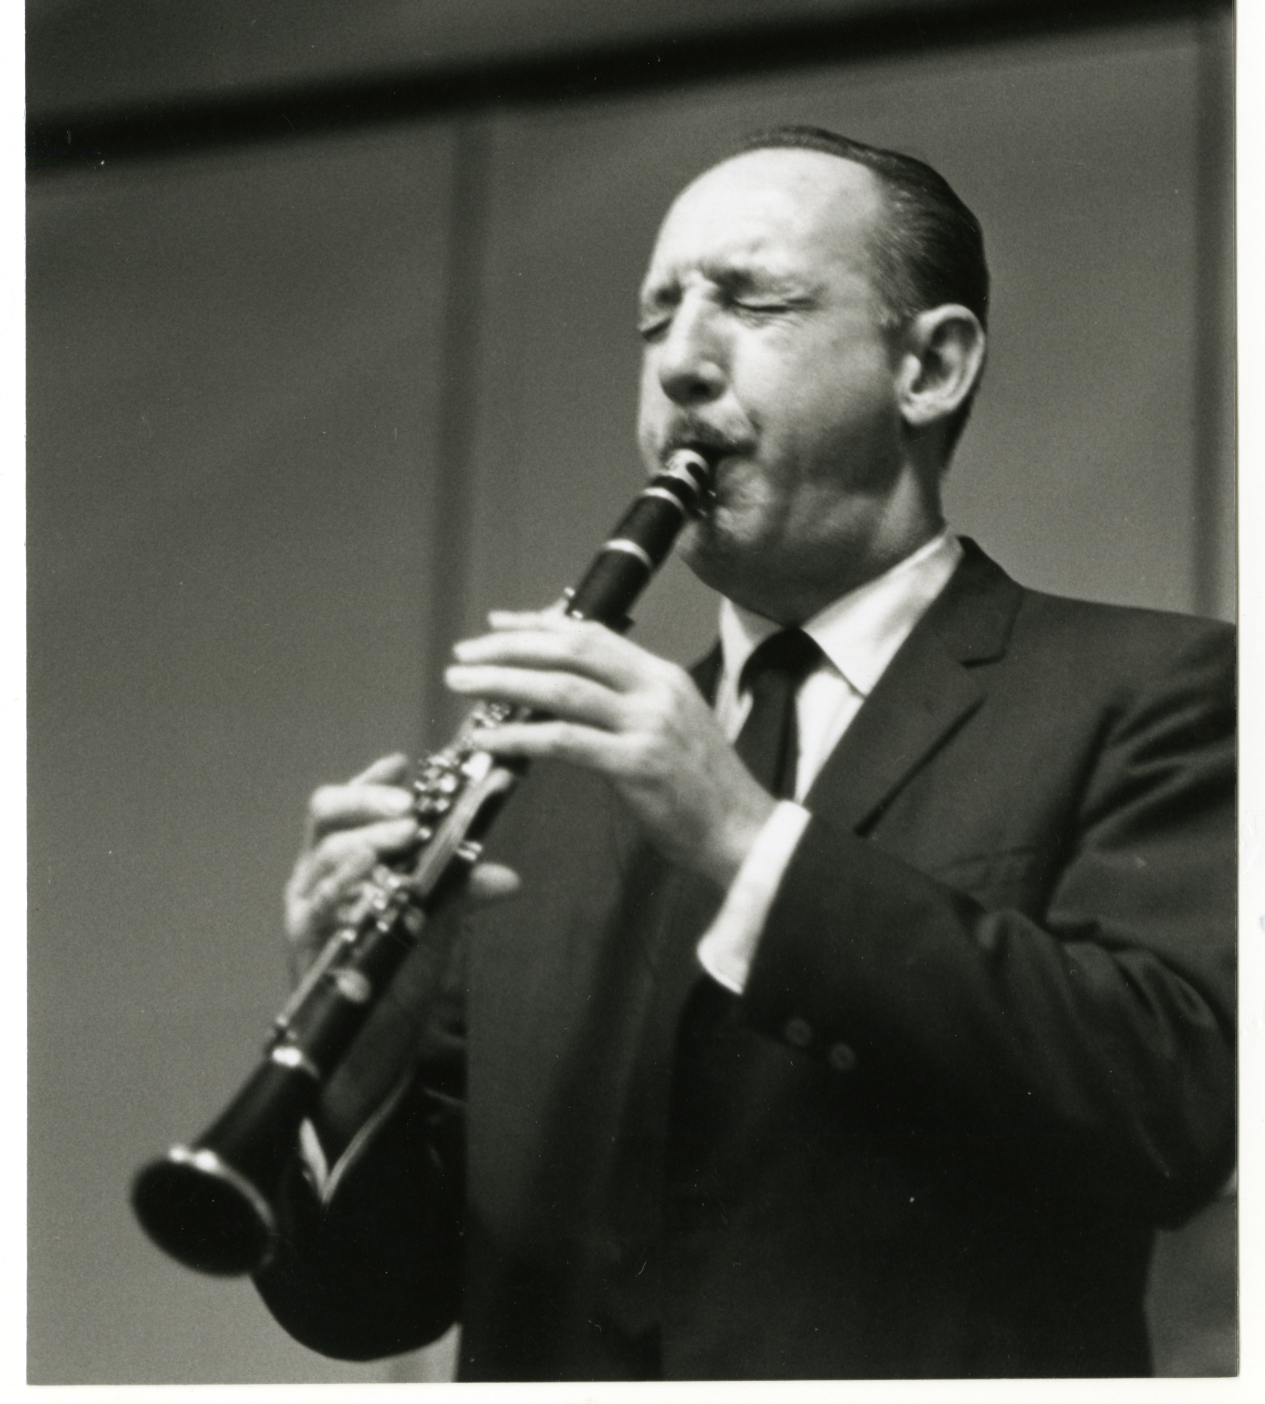 Bob Helm